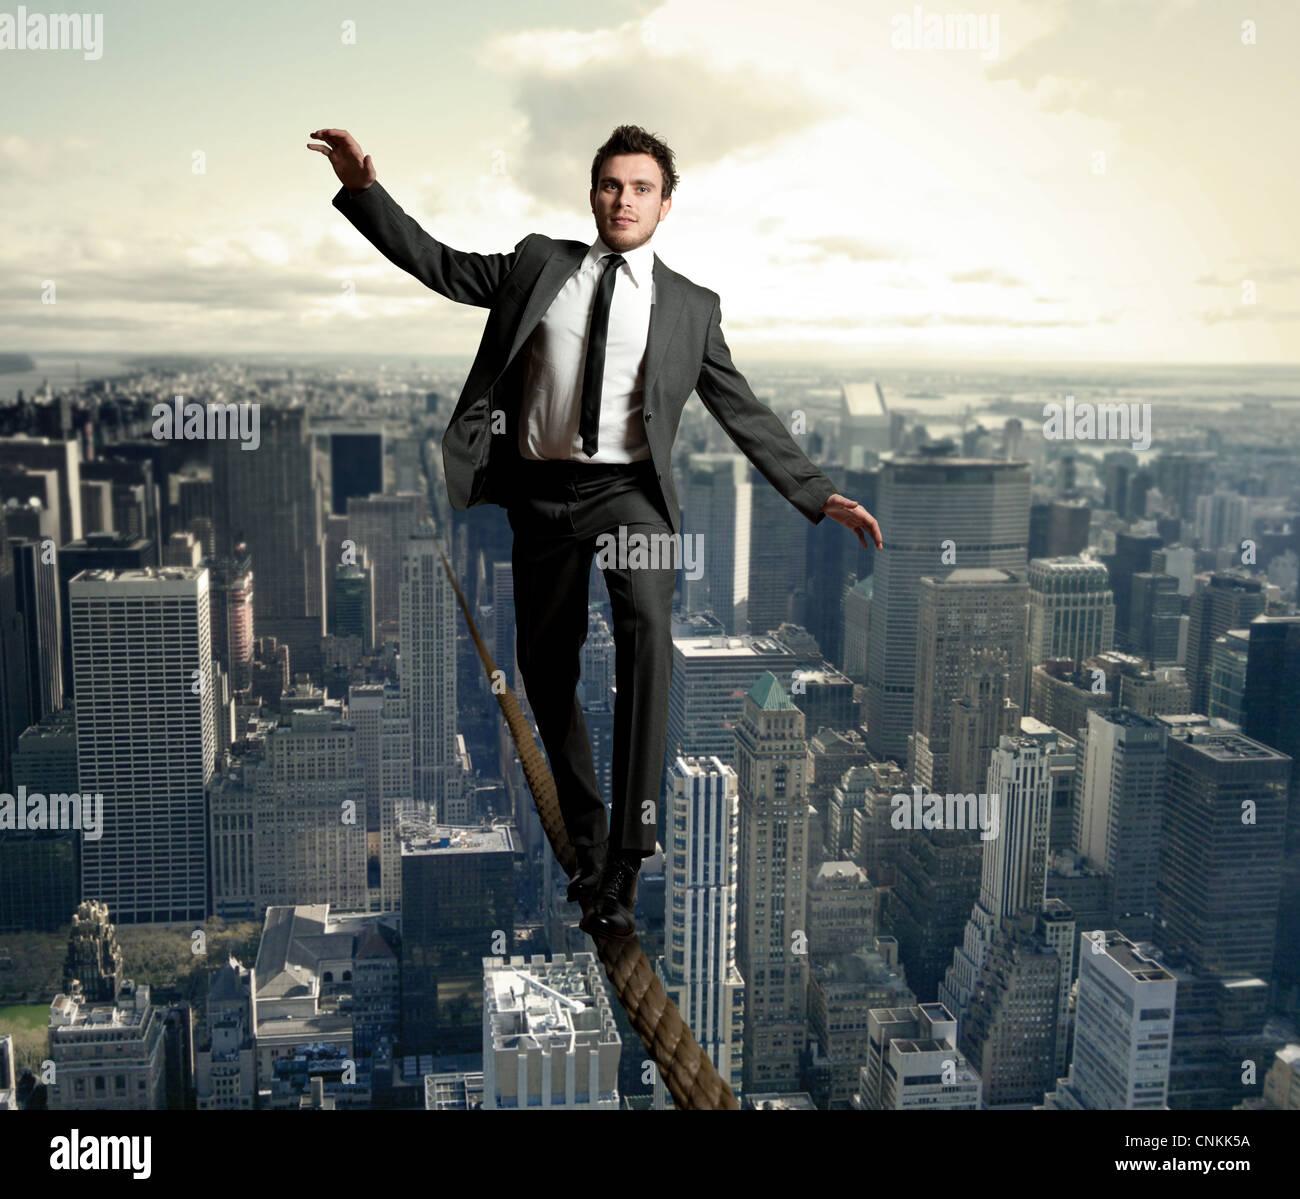 Imprenditore è in equilibrio su una fune Immagini Stock